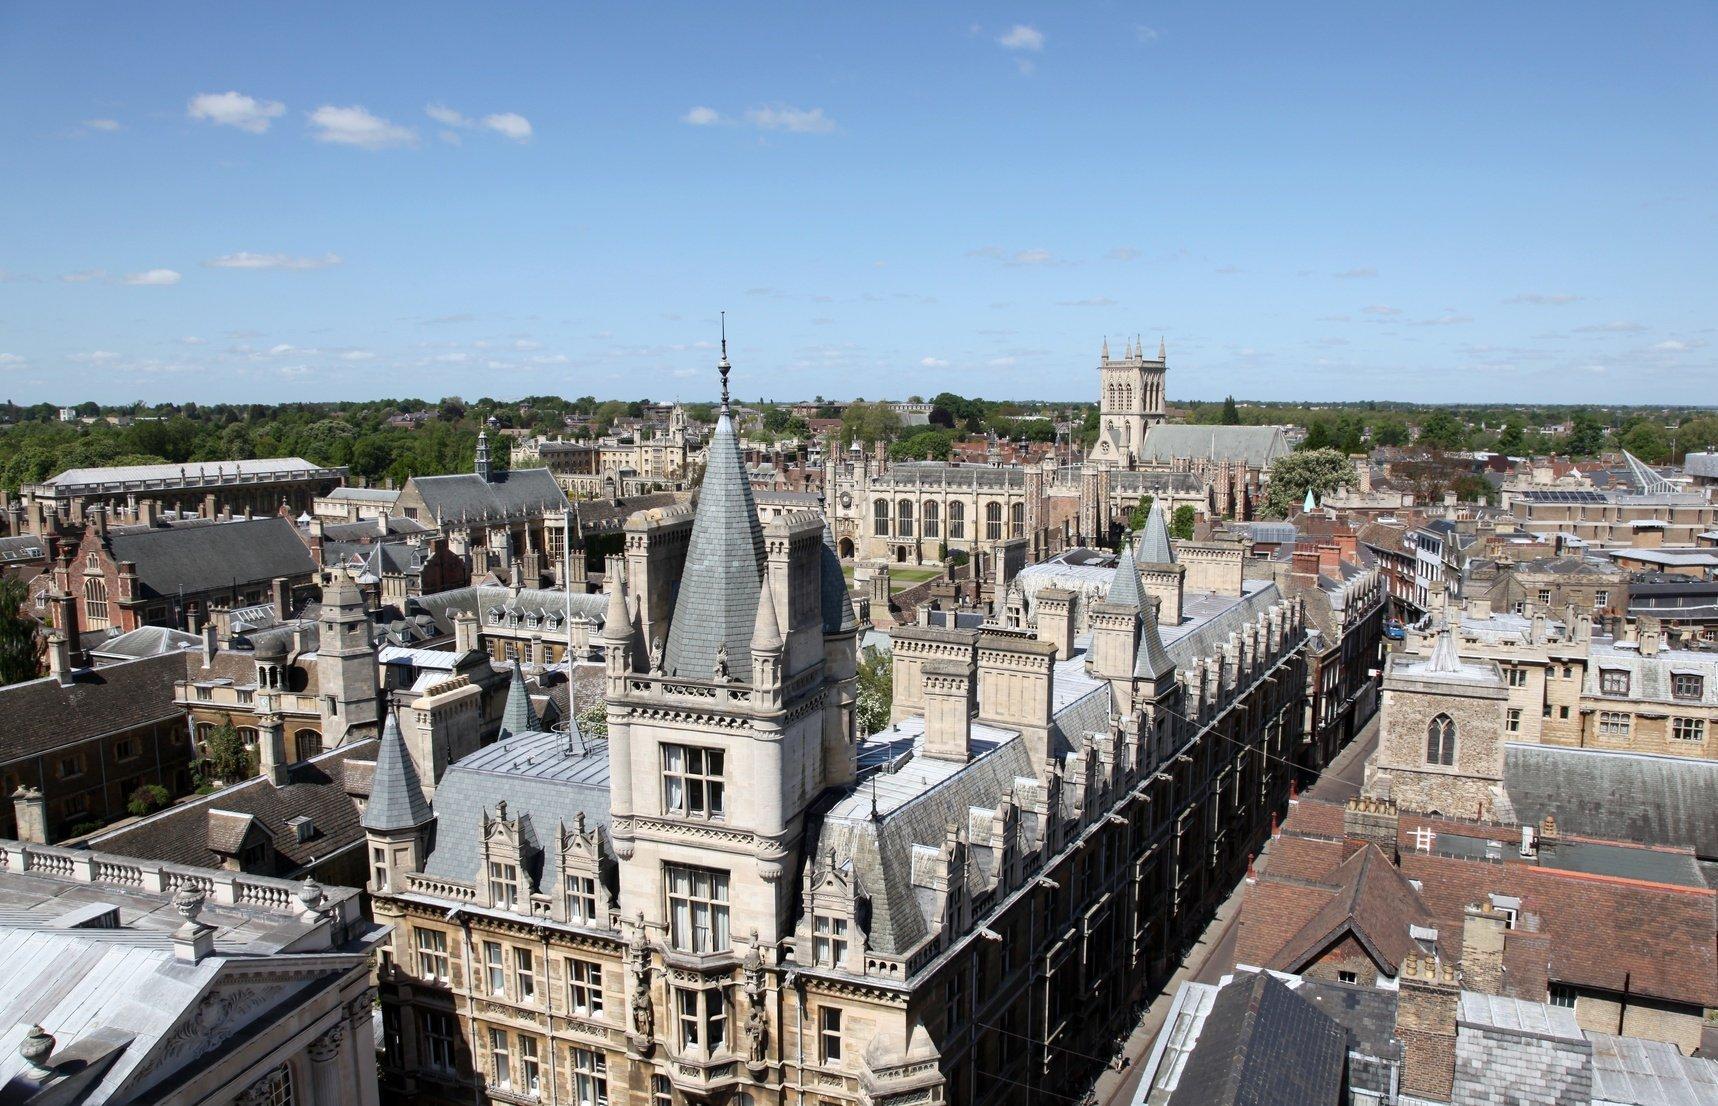 us vs. uk college costs